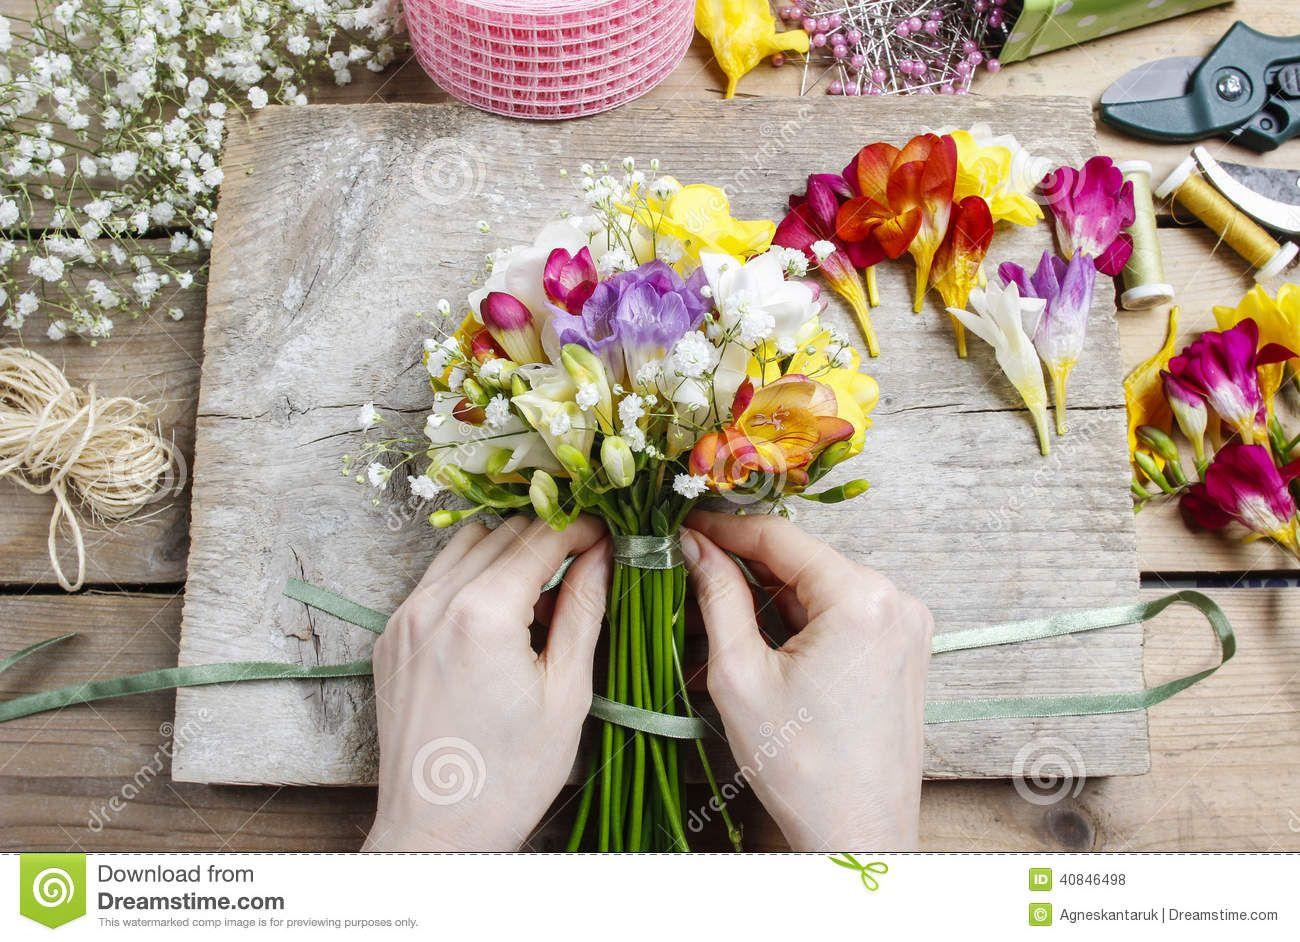 Florist work woman making bouquet freesia flowers house decoration florist work woman making bouquet freesia flowers house izmirmasajfo Gallery